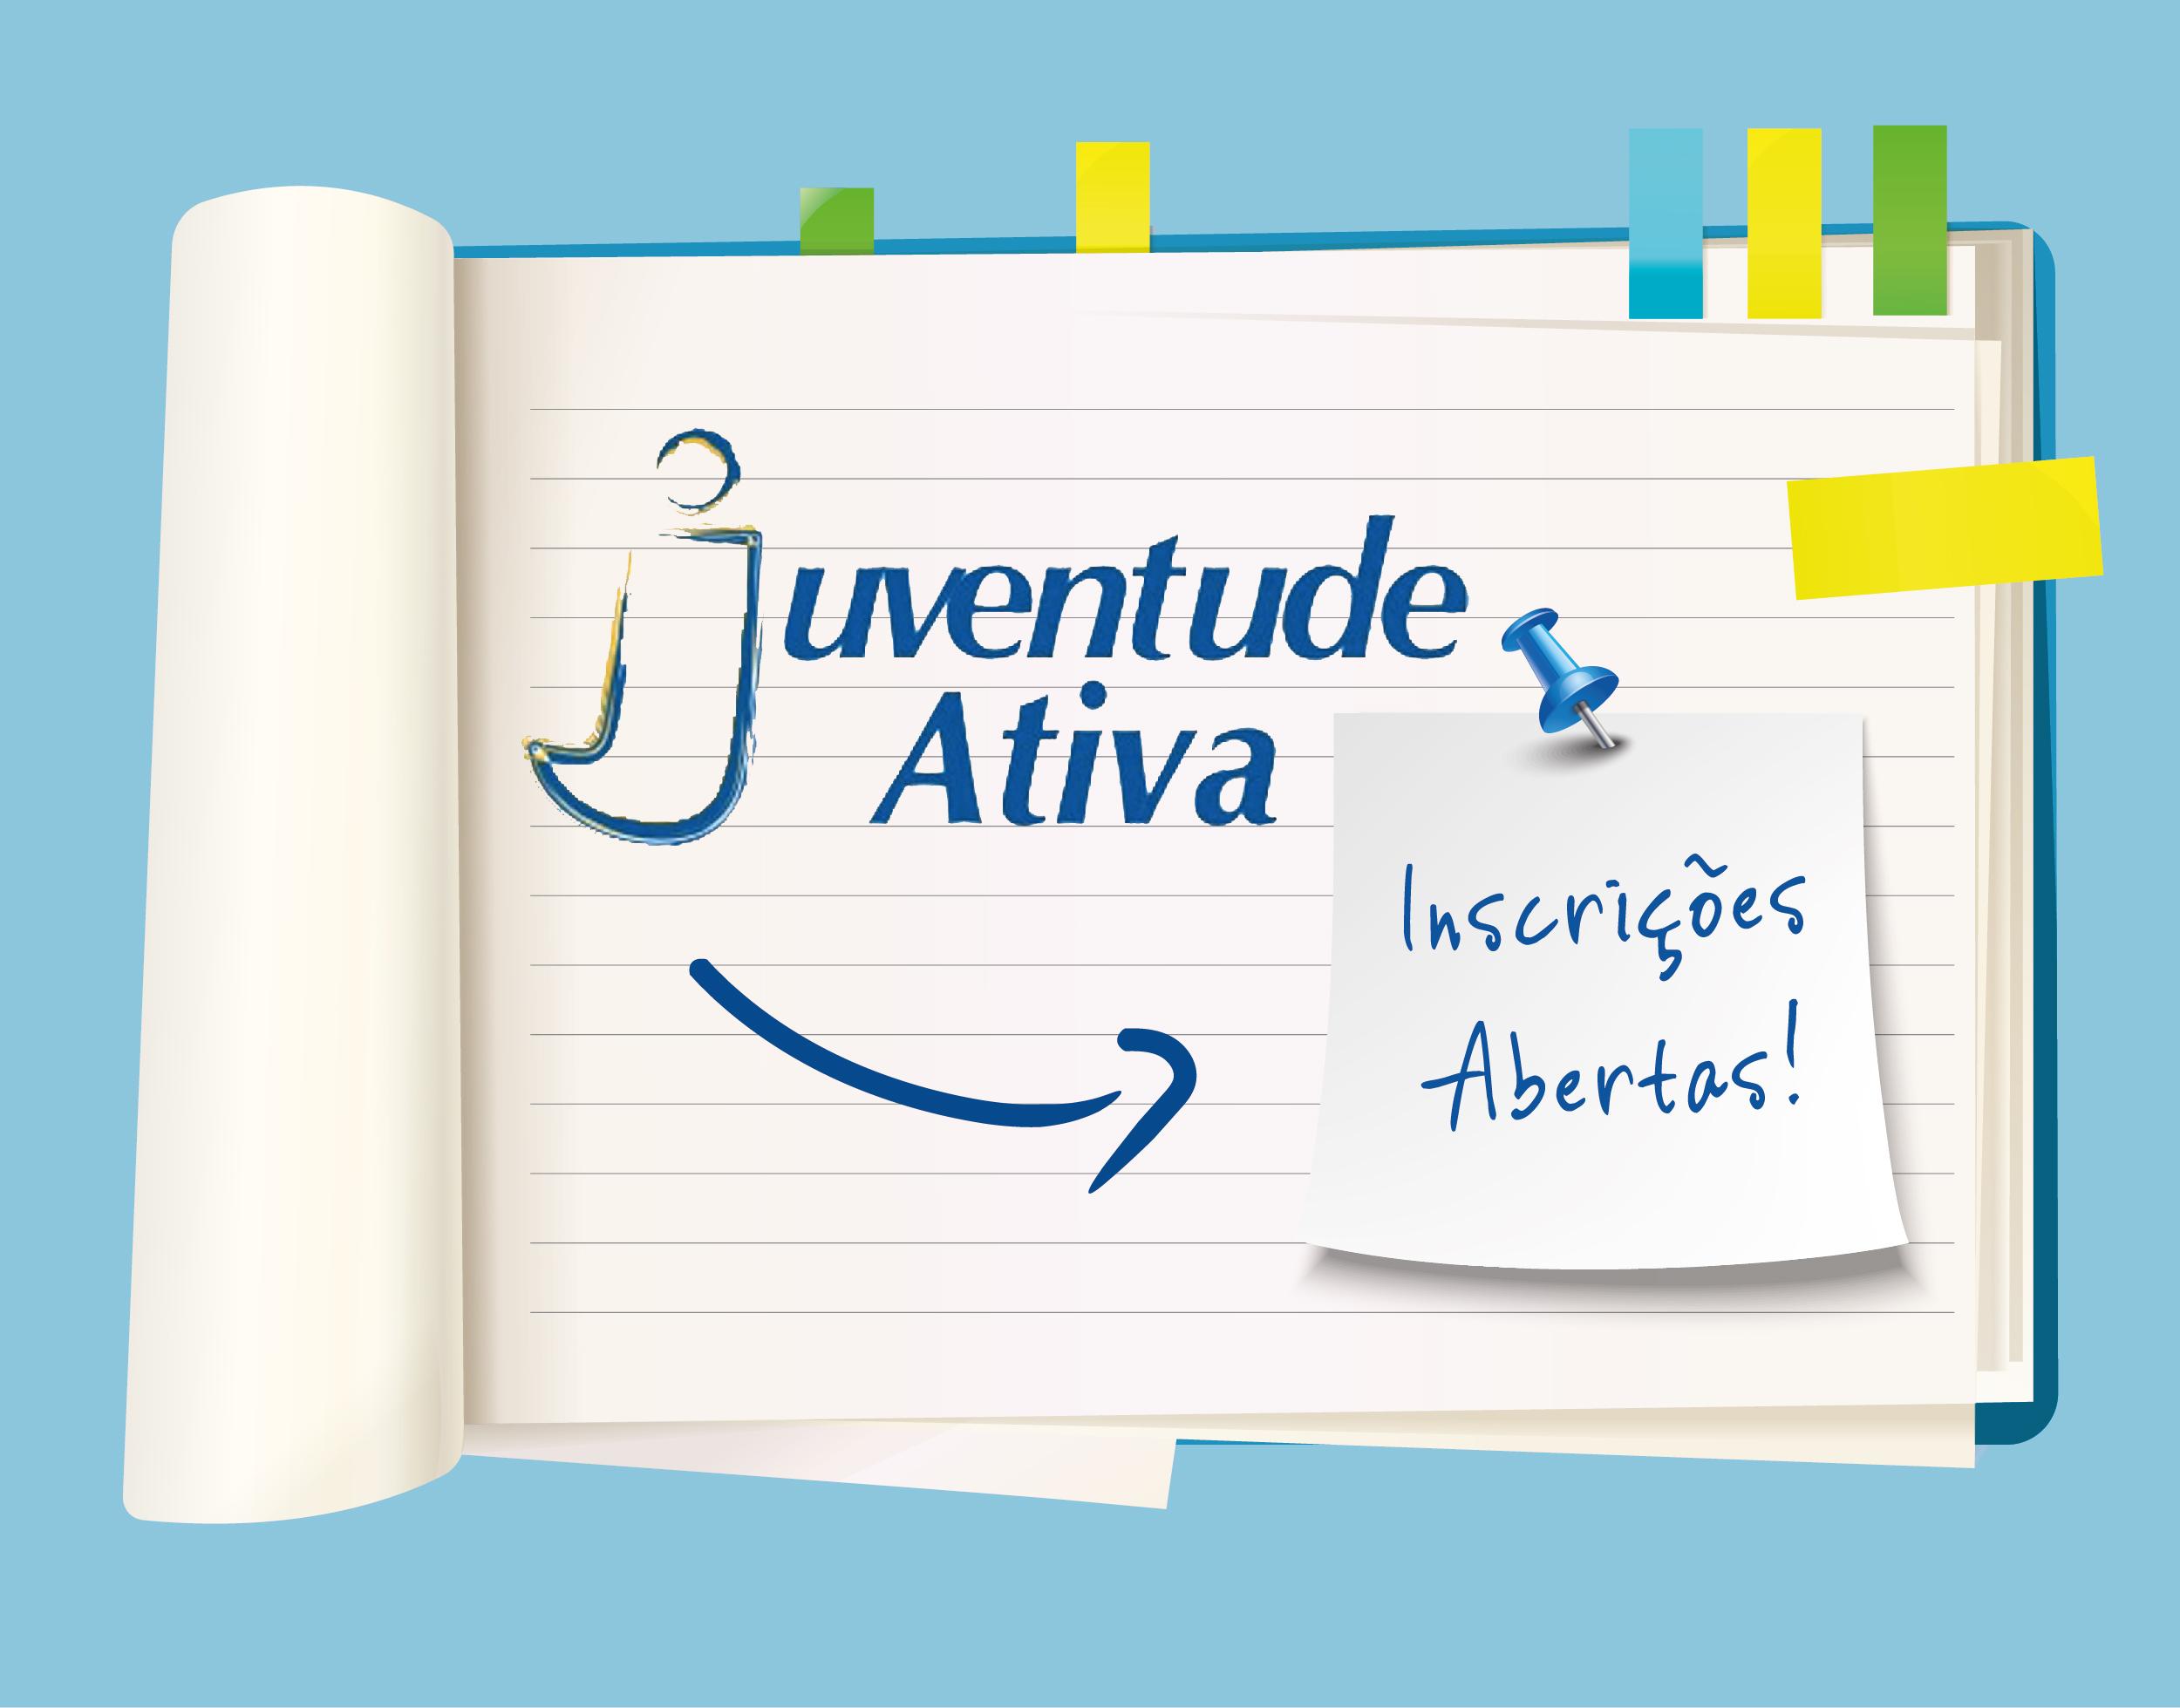 Programa Juventude Ativa - Inscrições abertas